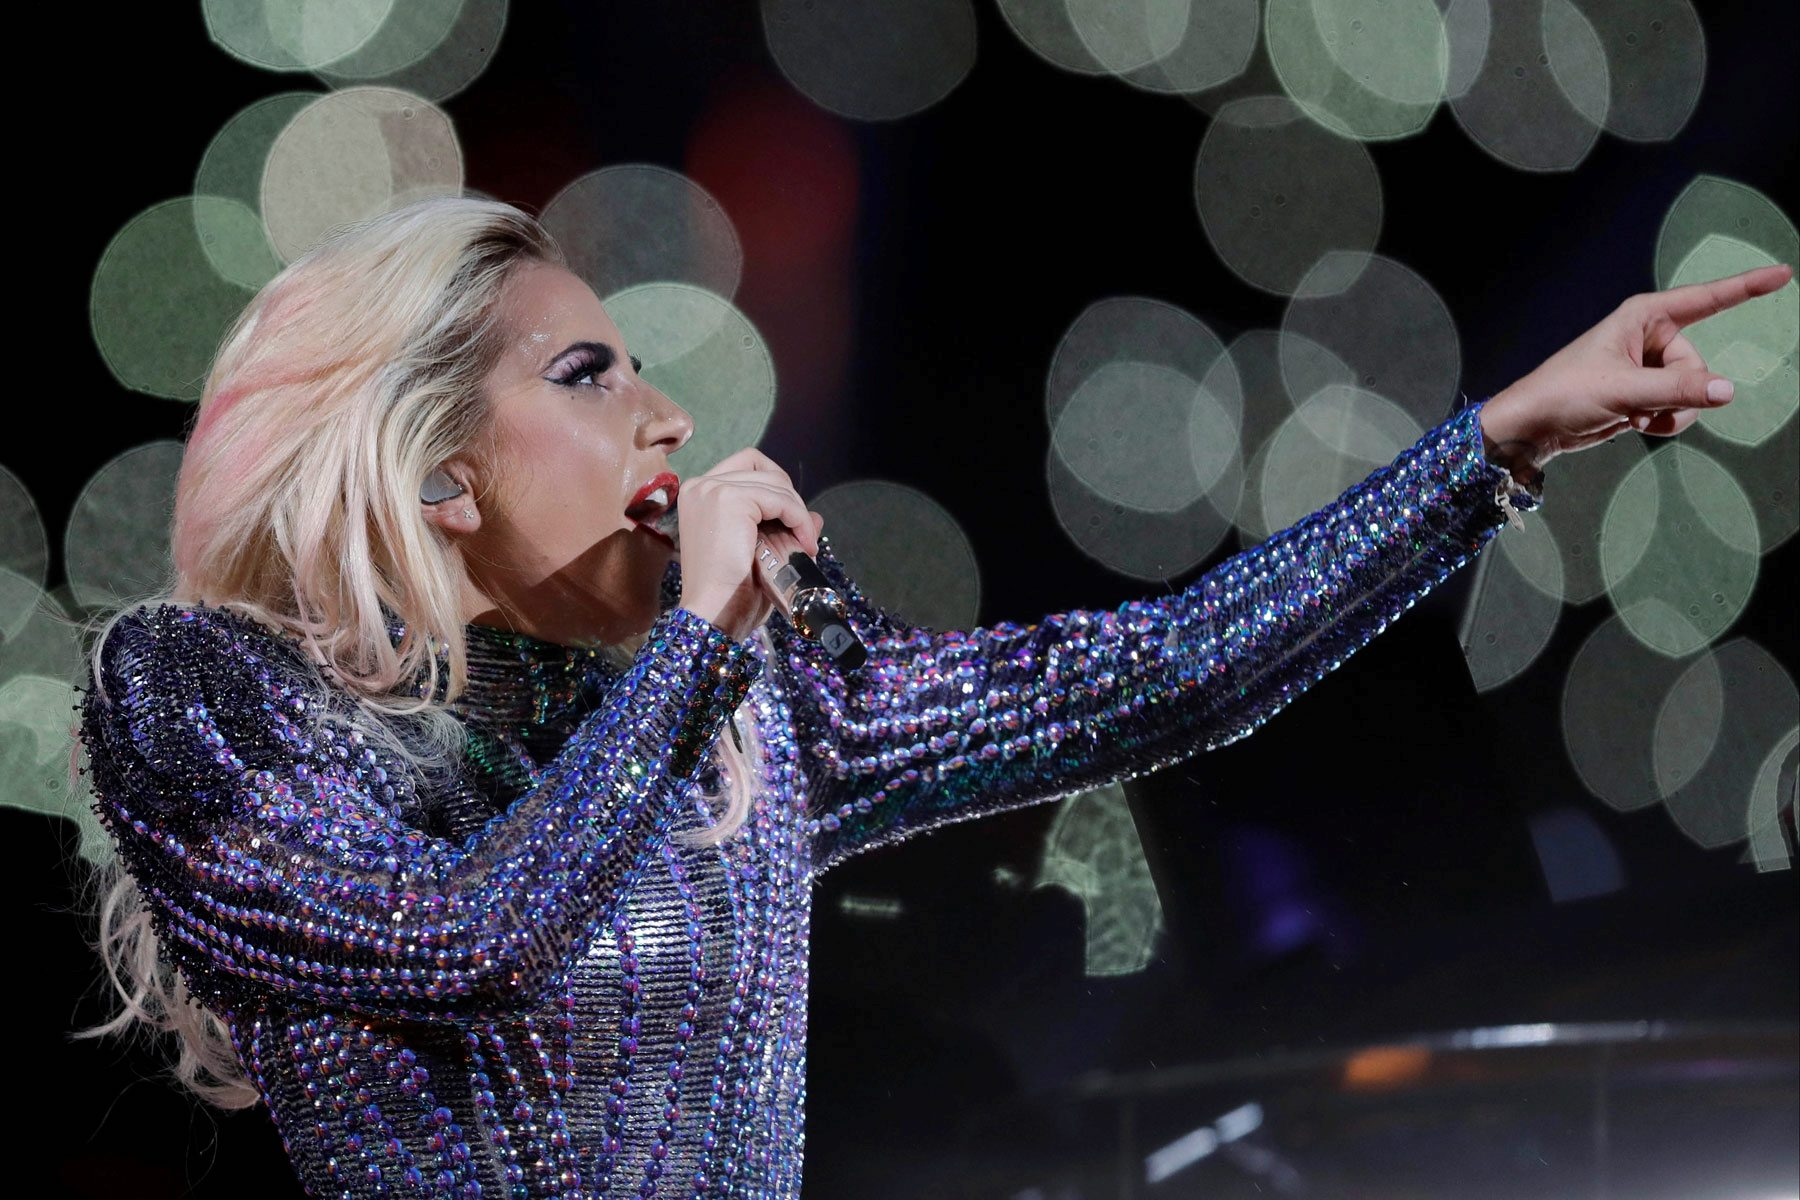 Lady Gaga and Super Bowl bear criticism - Washington Times